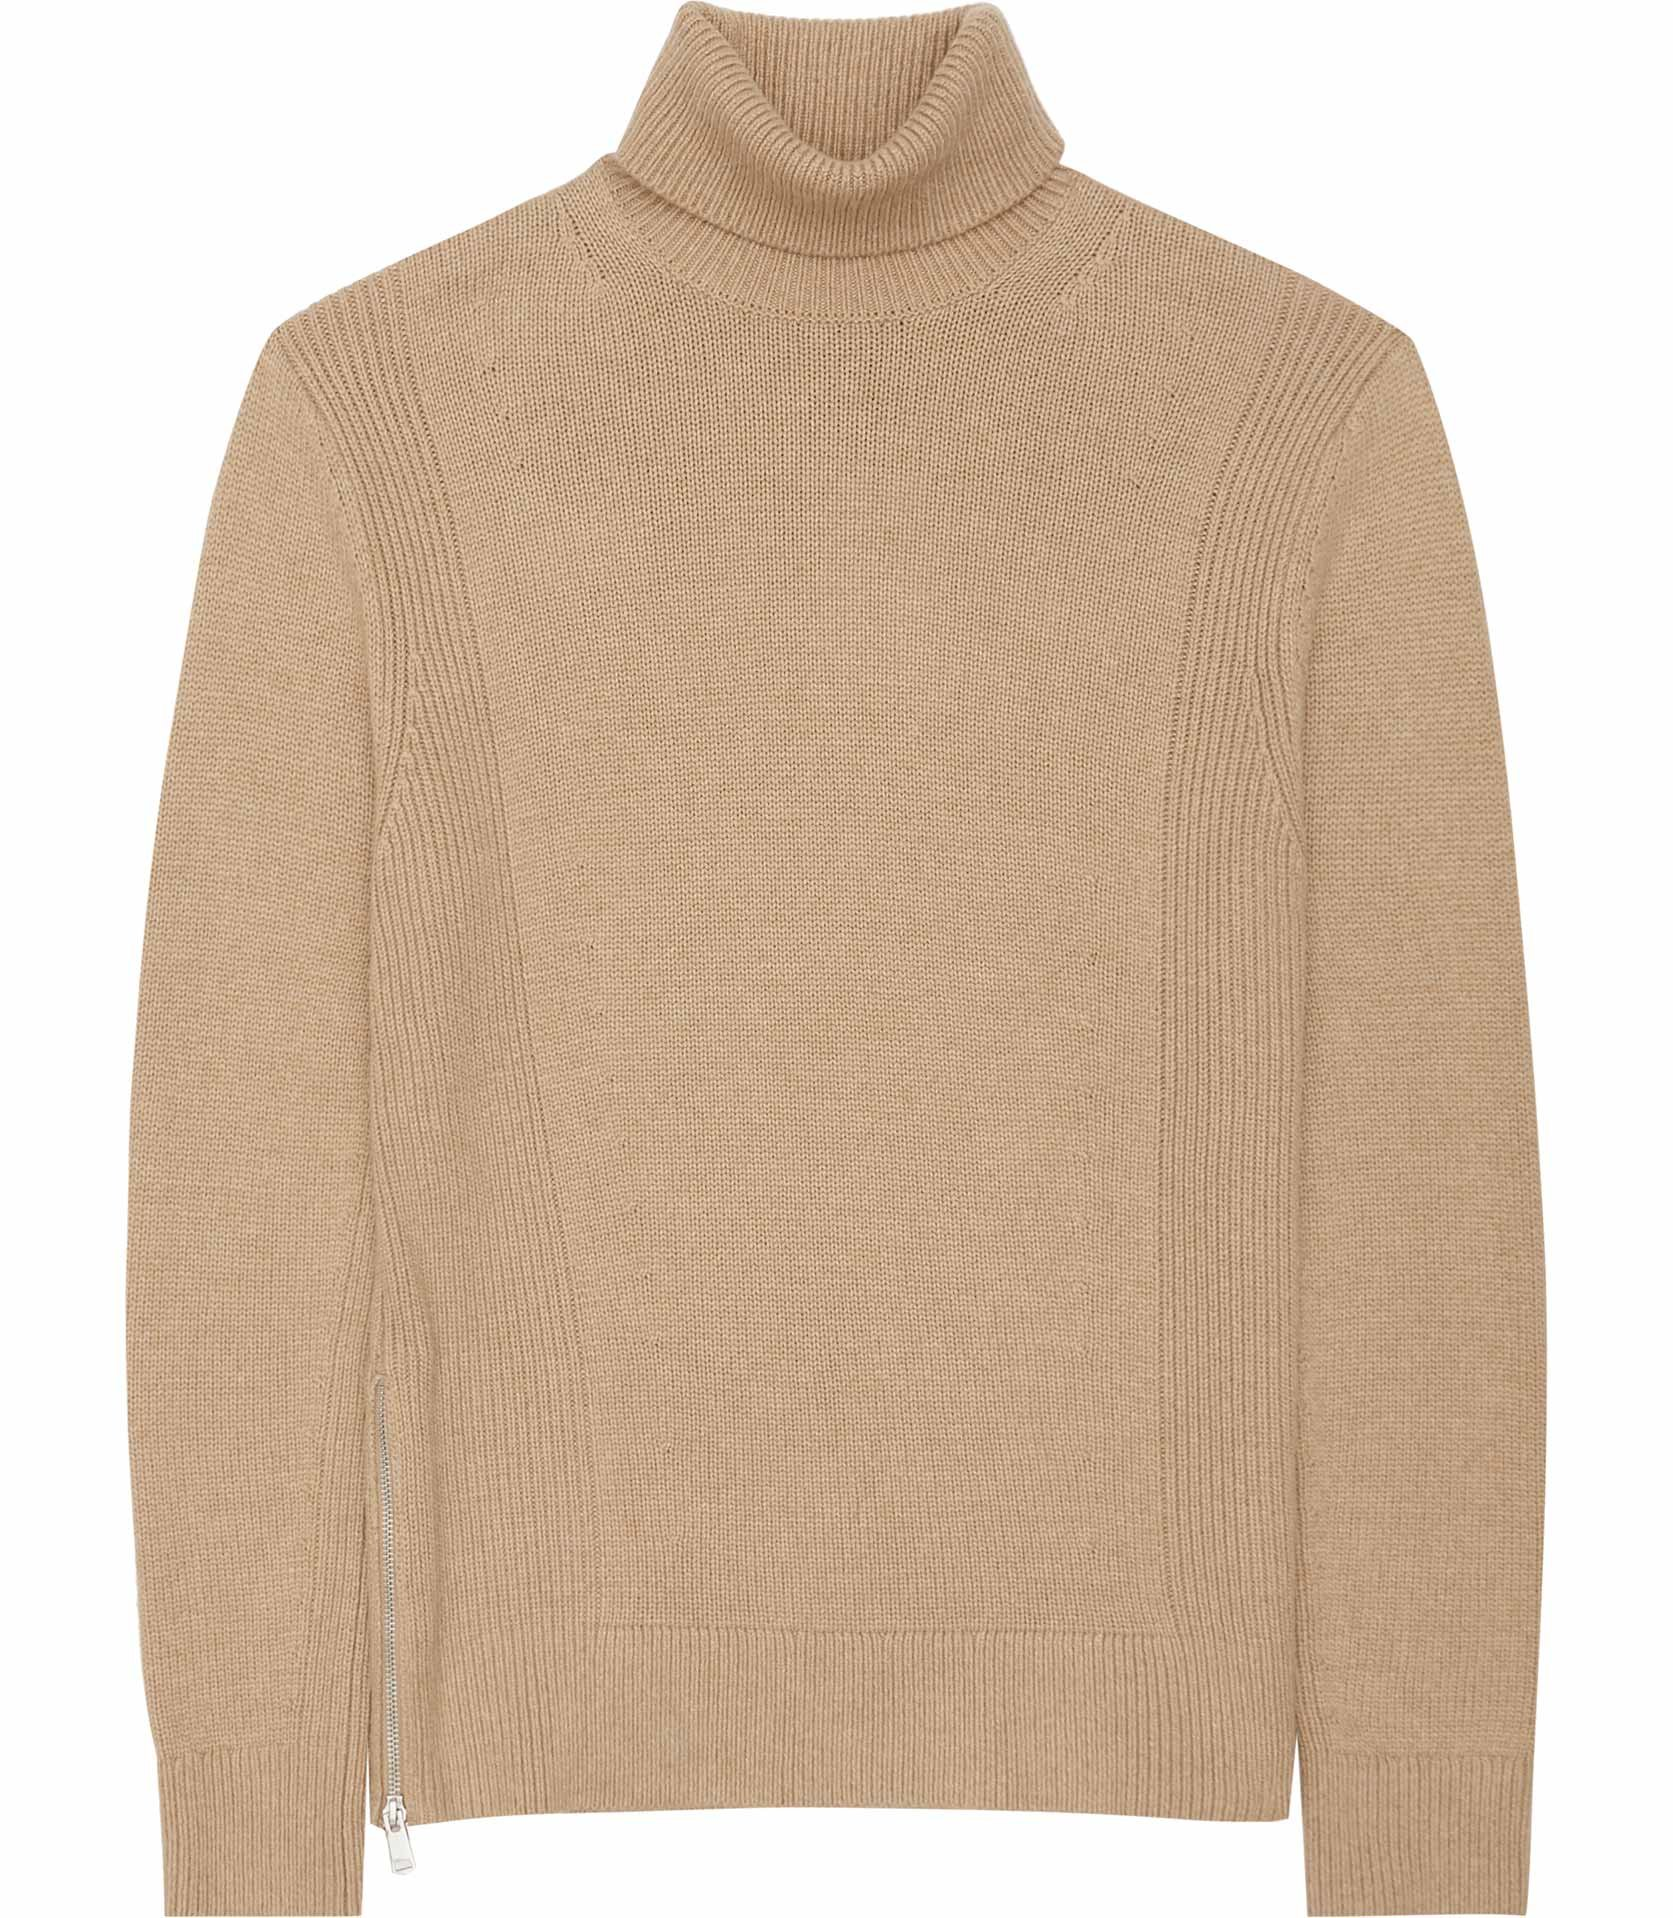 Reiss Camel Roll-neck £125